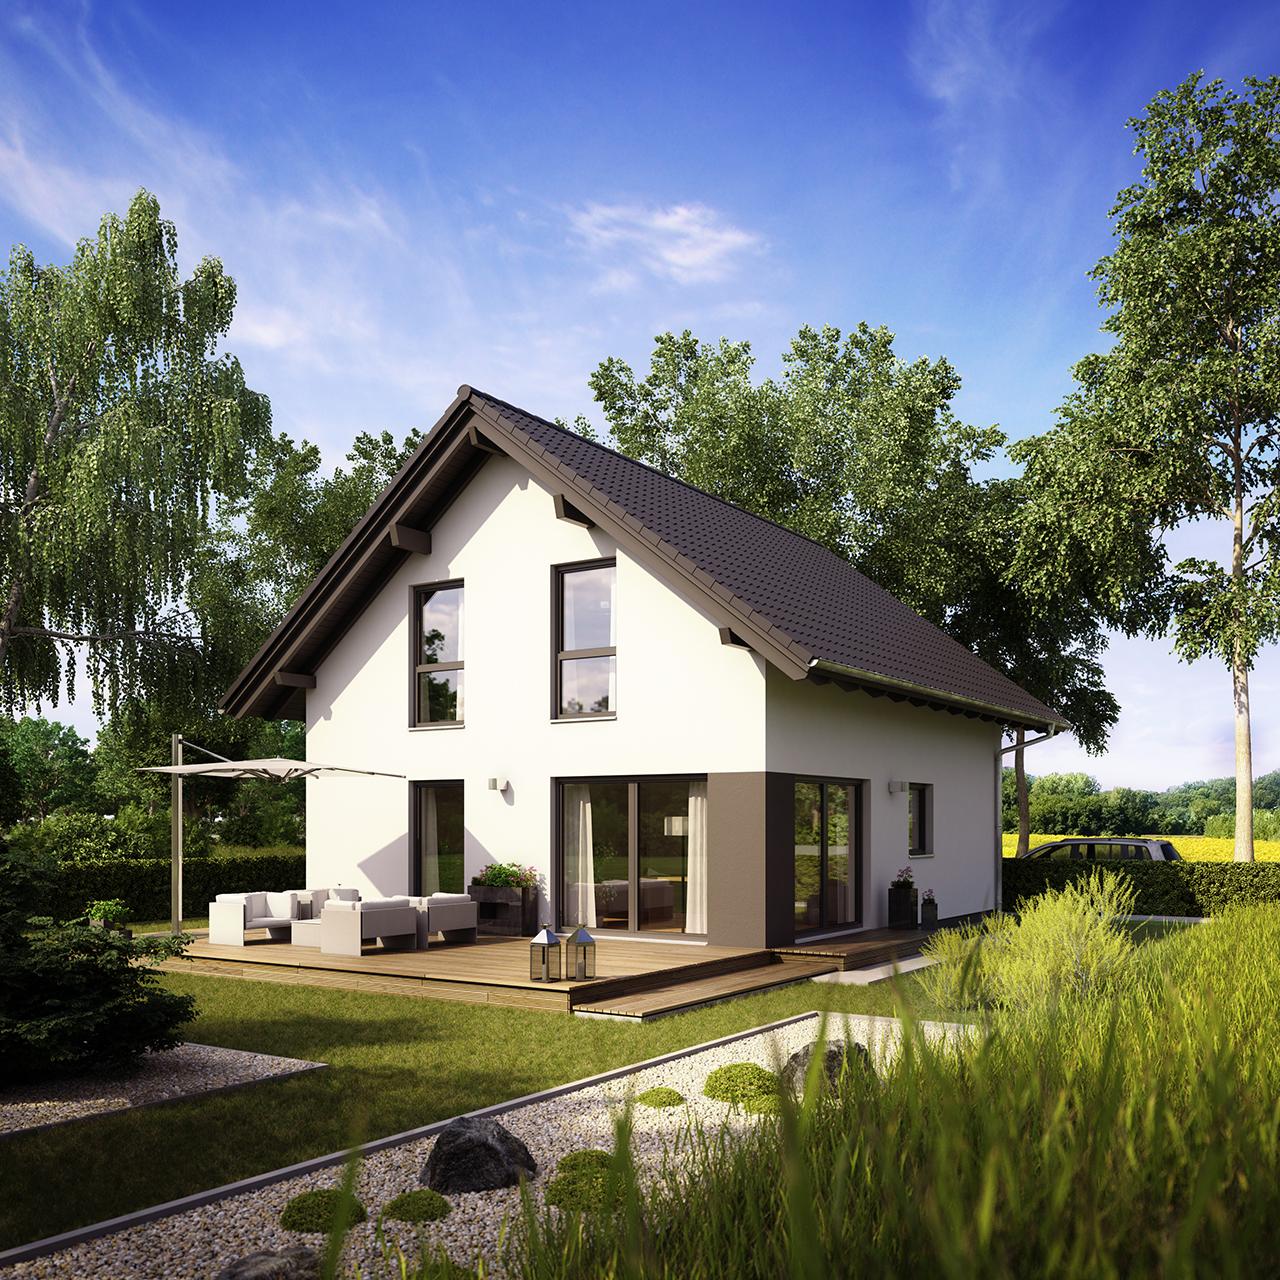 Fingerhaus neo 311  MEDLEY 3.0 mit 1,00 m Kniestock - Bauplanung Harald Skroch